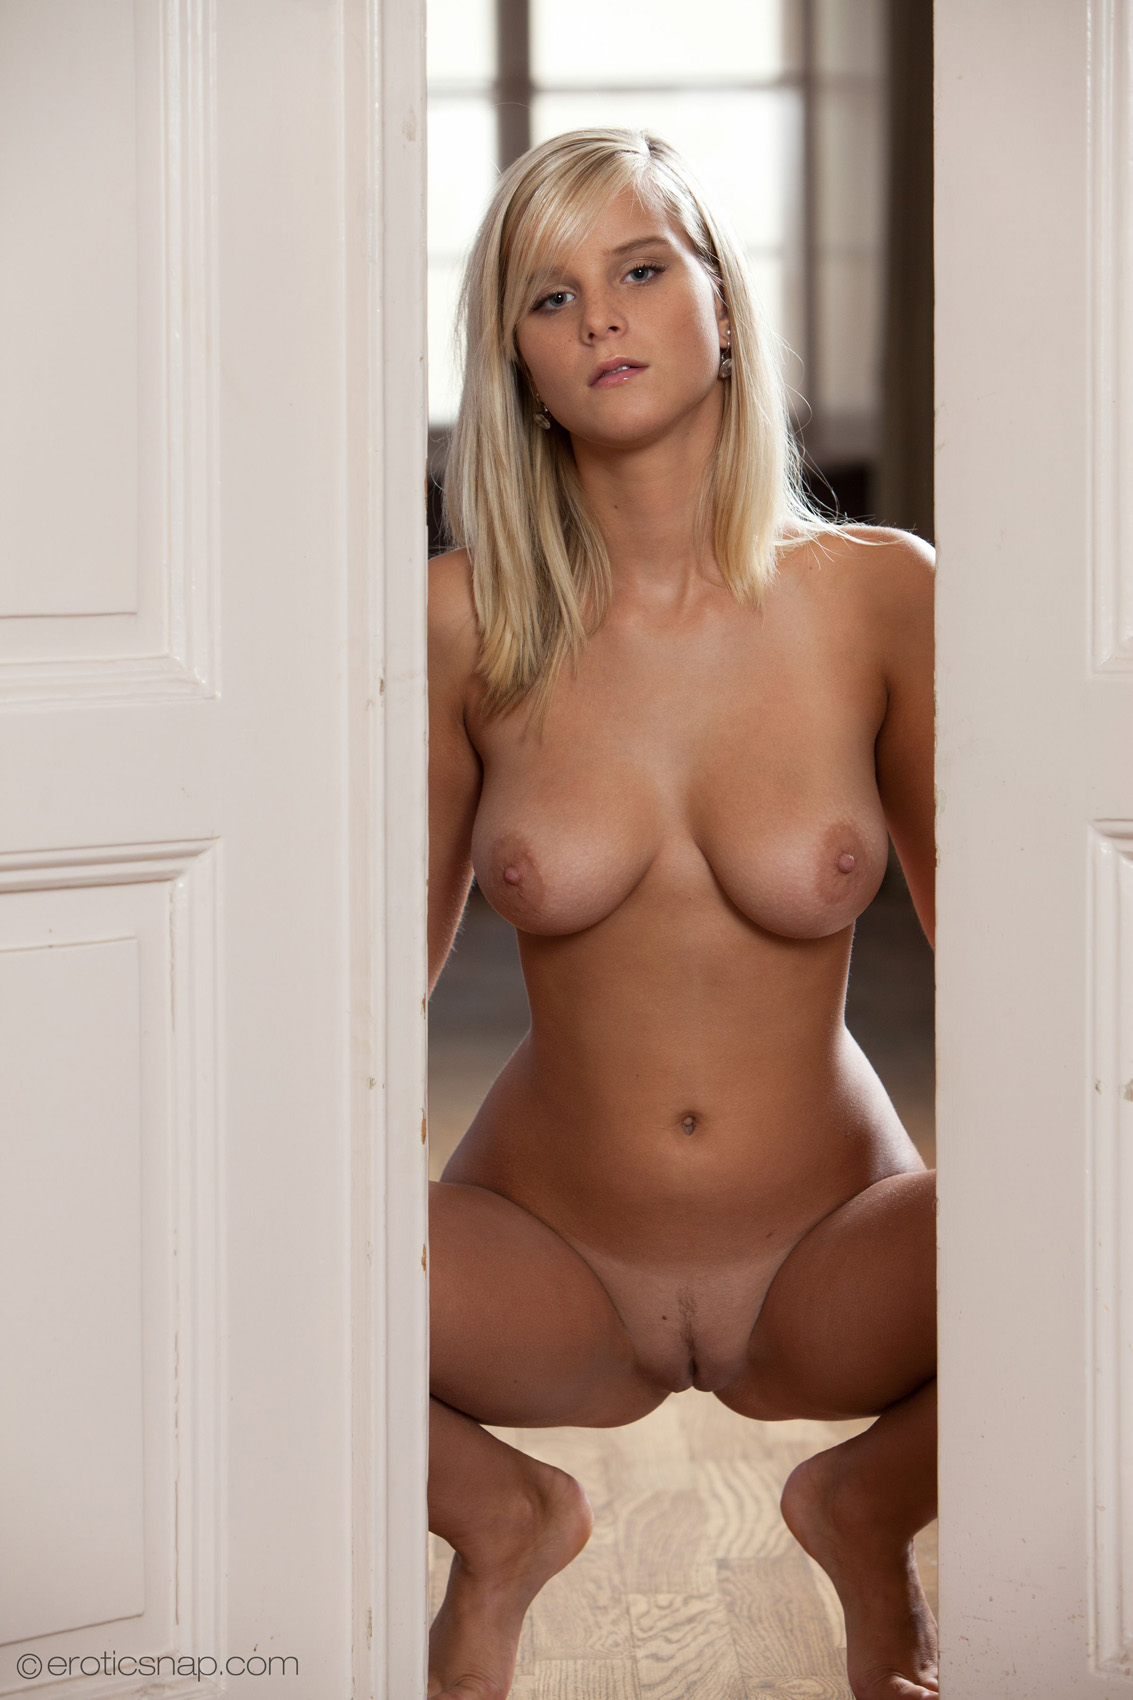 snap nude Erotic